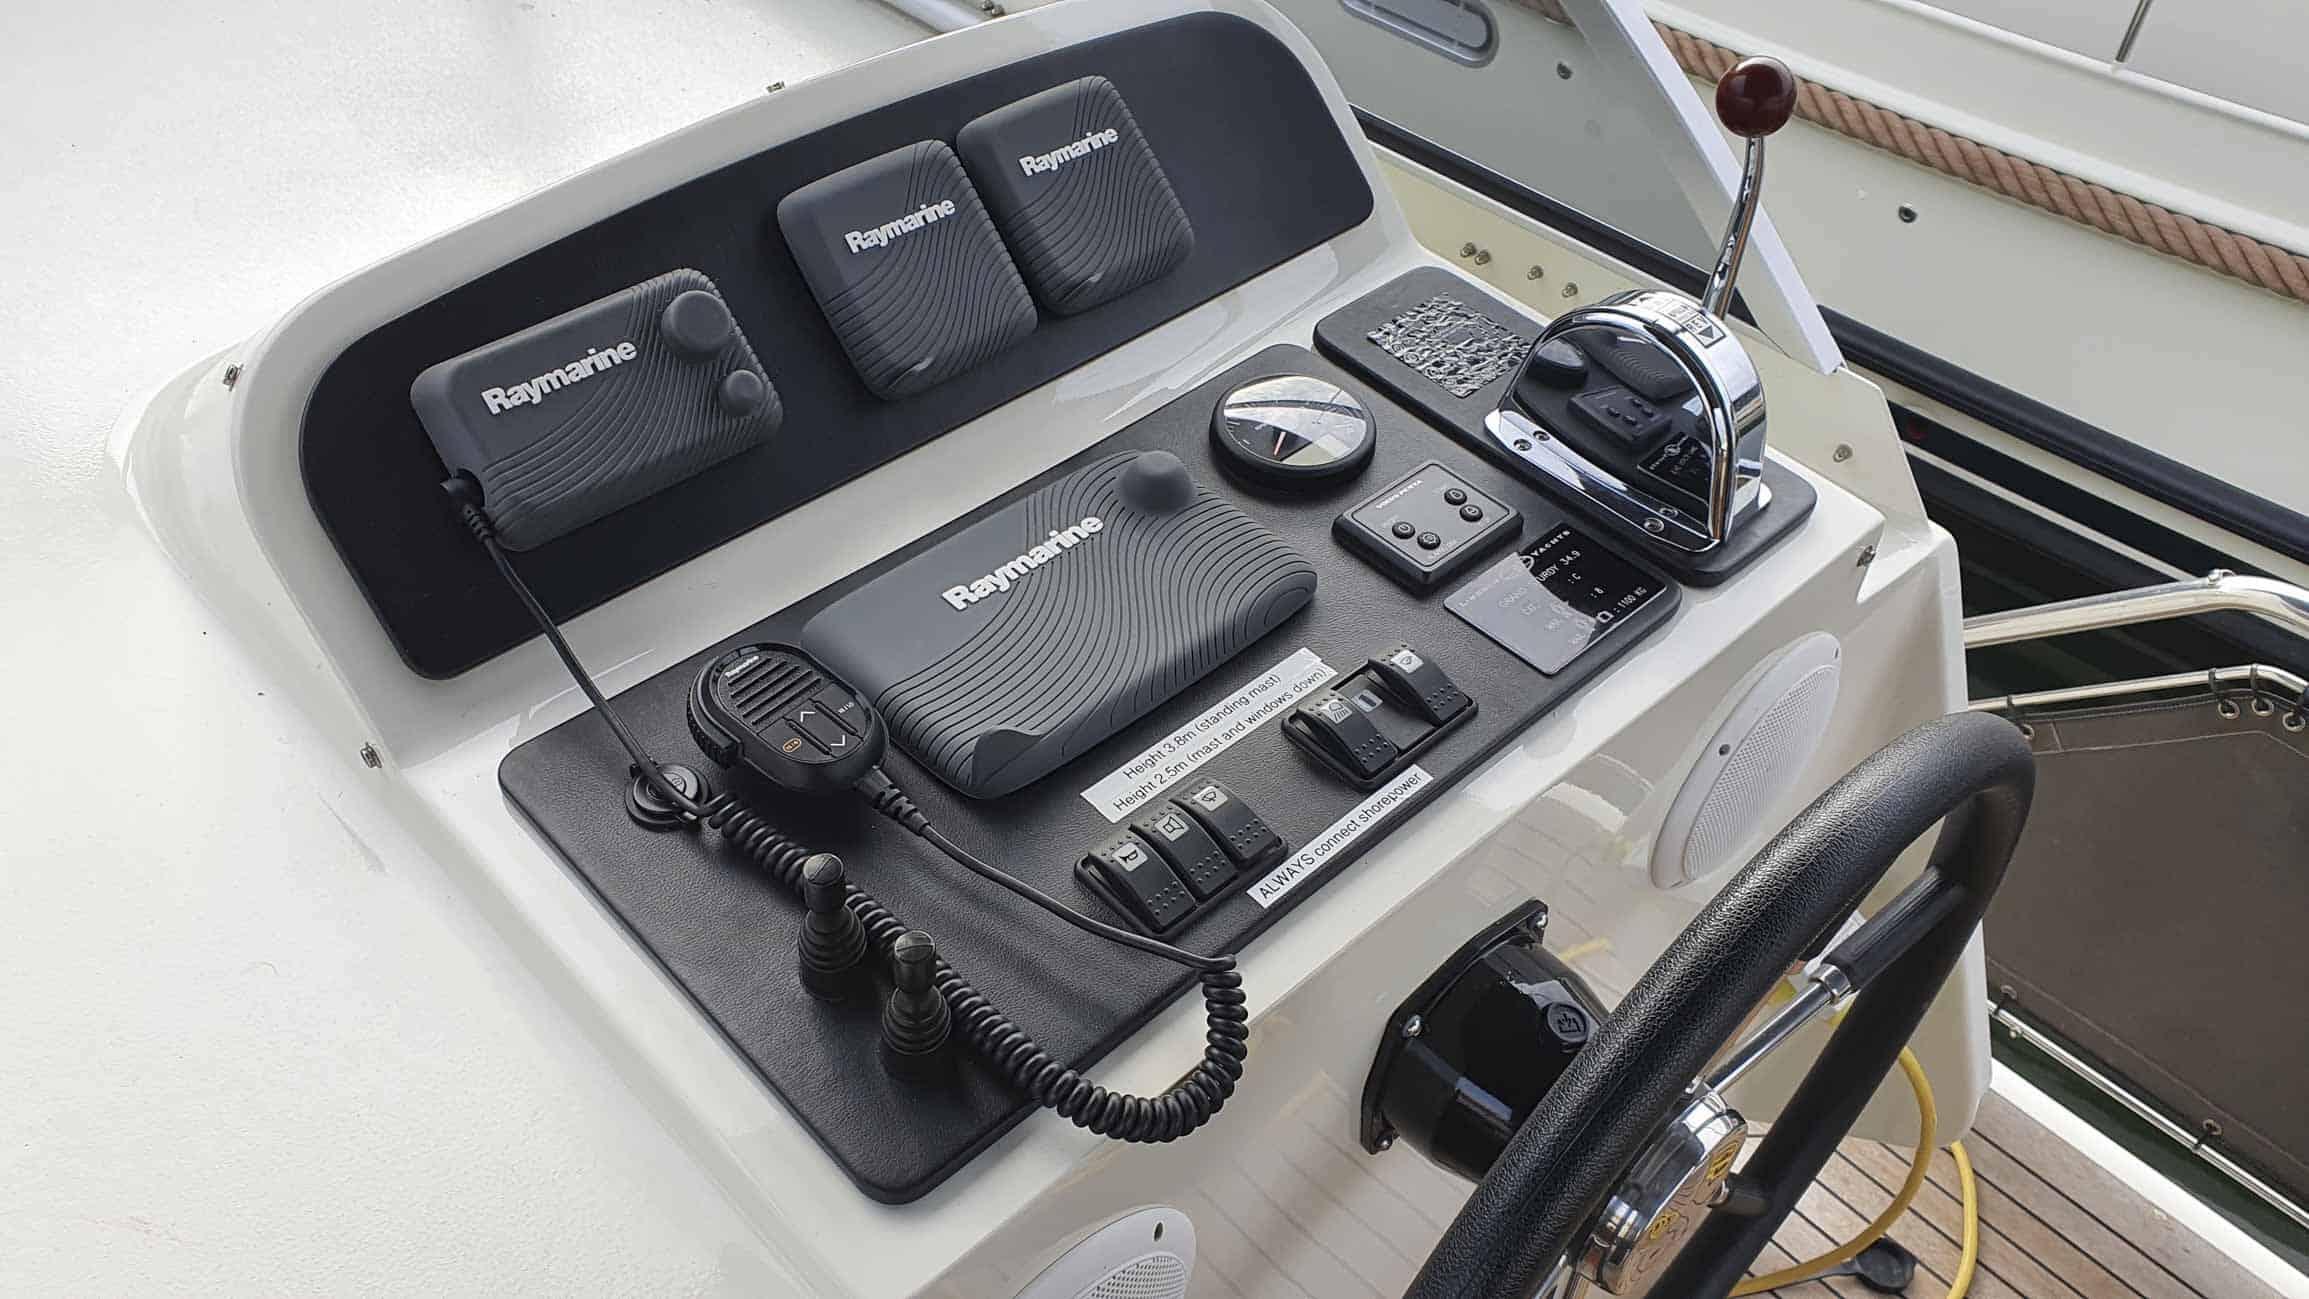 gebruikt-motorjacht-grand-sturdy-34-9-ac-3115-023